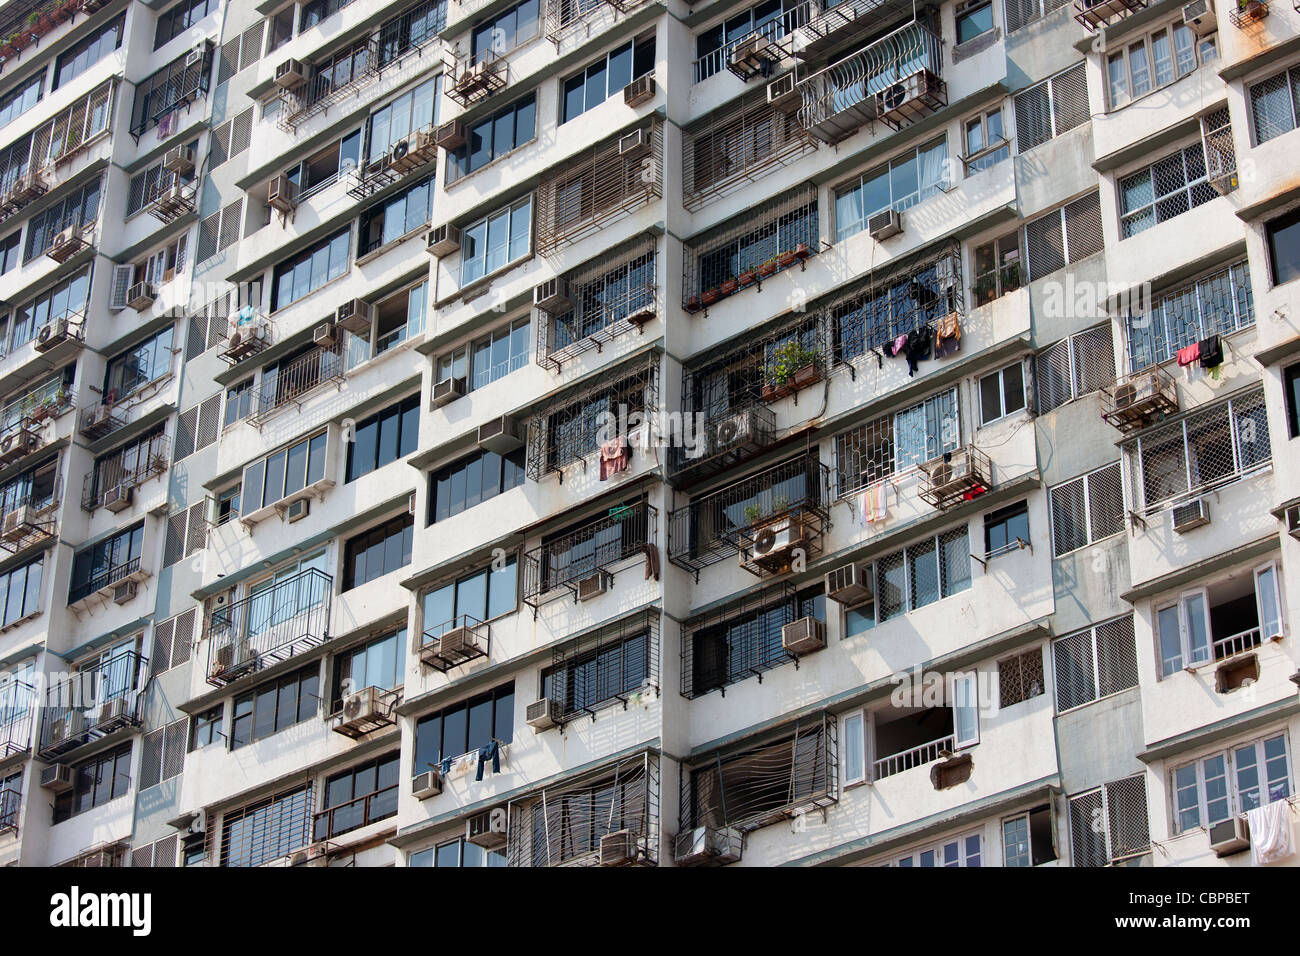 Tenement block in Mumbai, formerly Bombay, Maharashtra, India - Stock Image